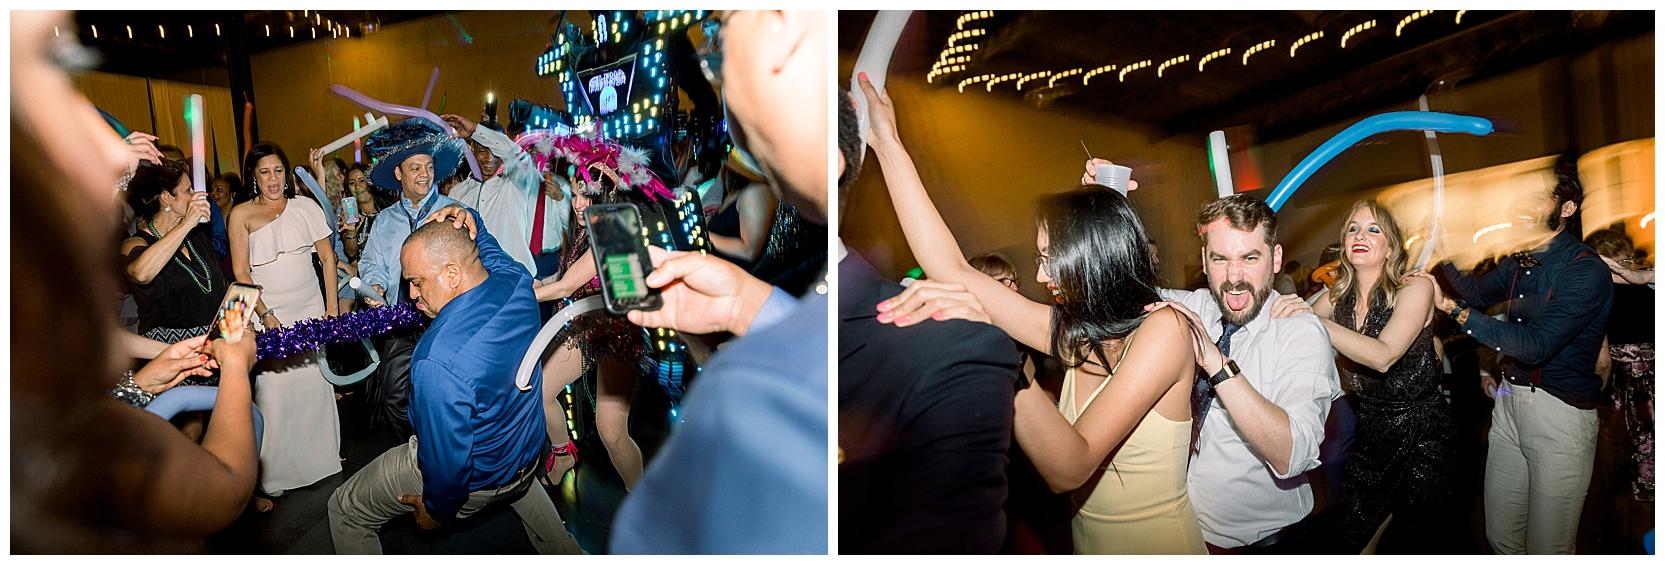 jessicafredericks_lakeland_tampa_wedding_purple_crazy hour_0094.jpg